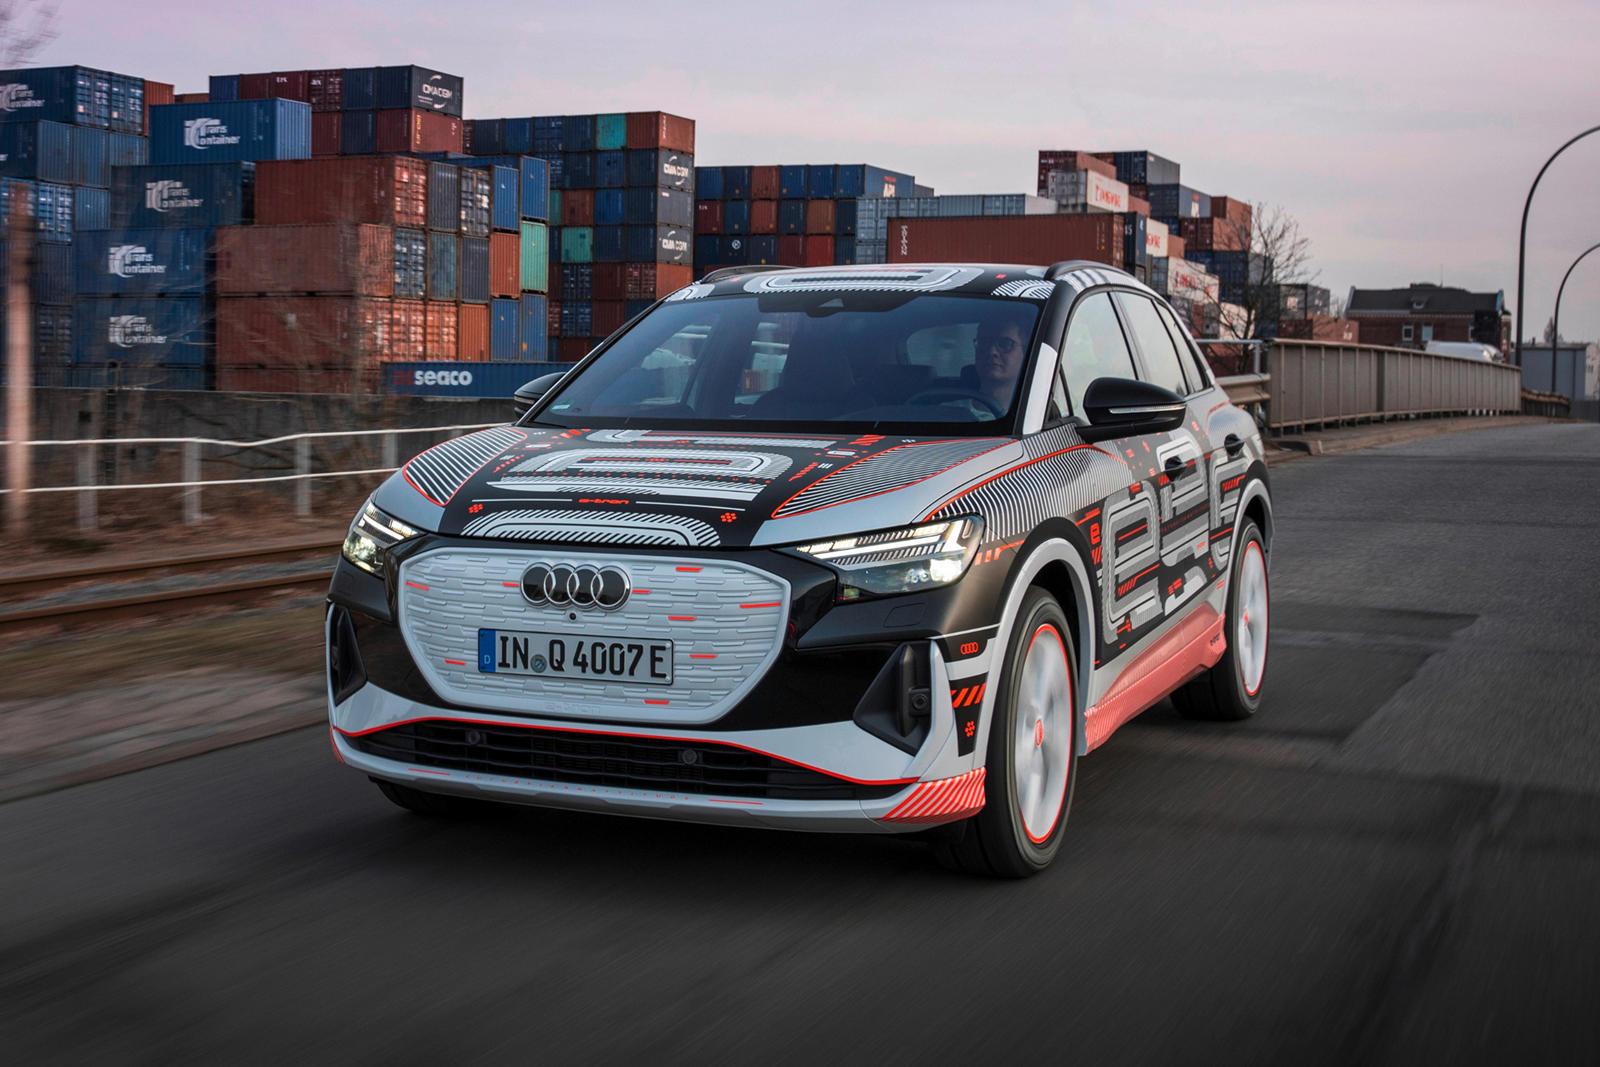 94987 Audi Teases Q4 e-tron's AR Head-Up Display And Lavish Cabin